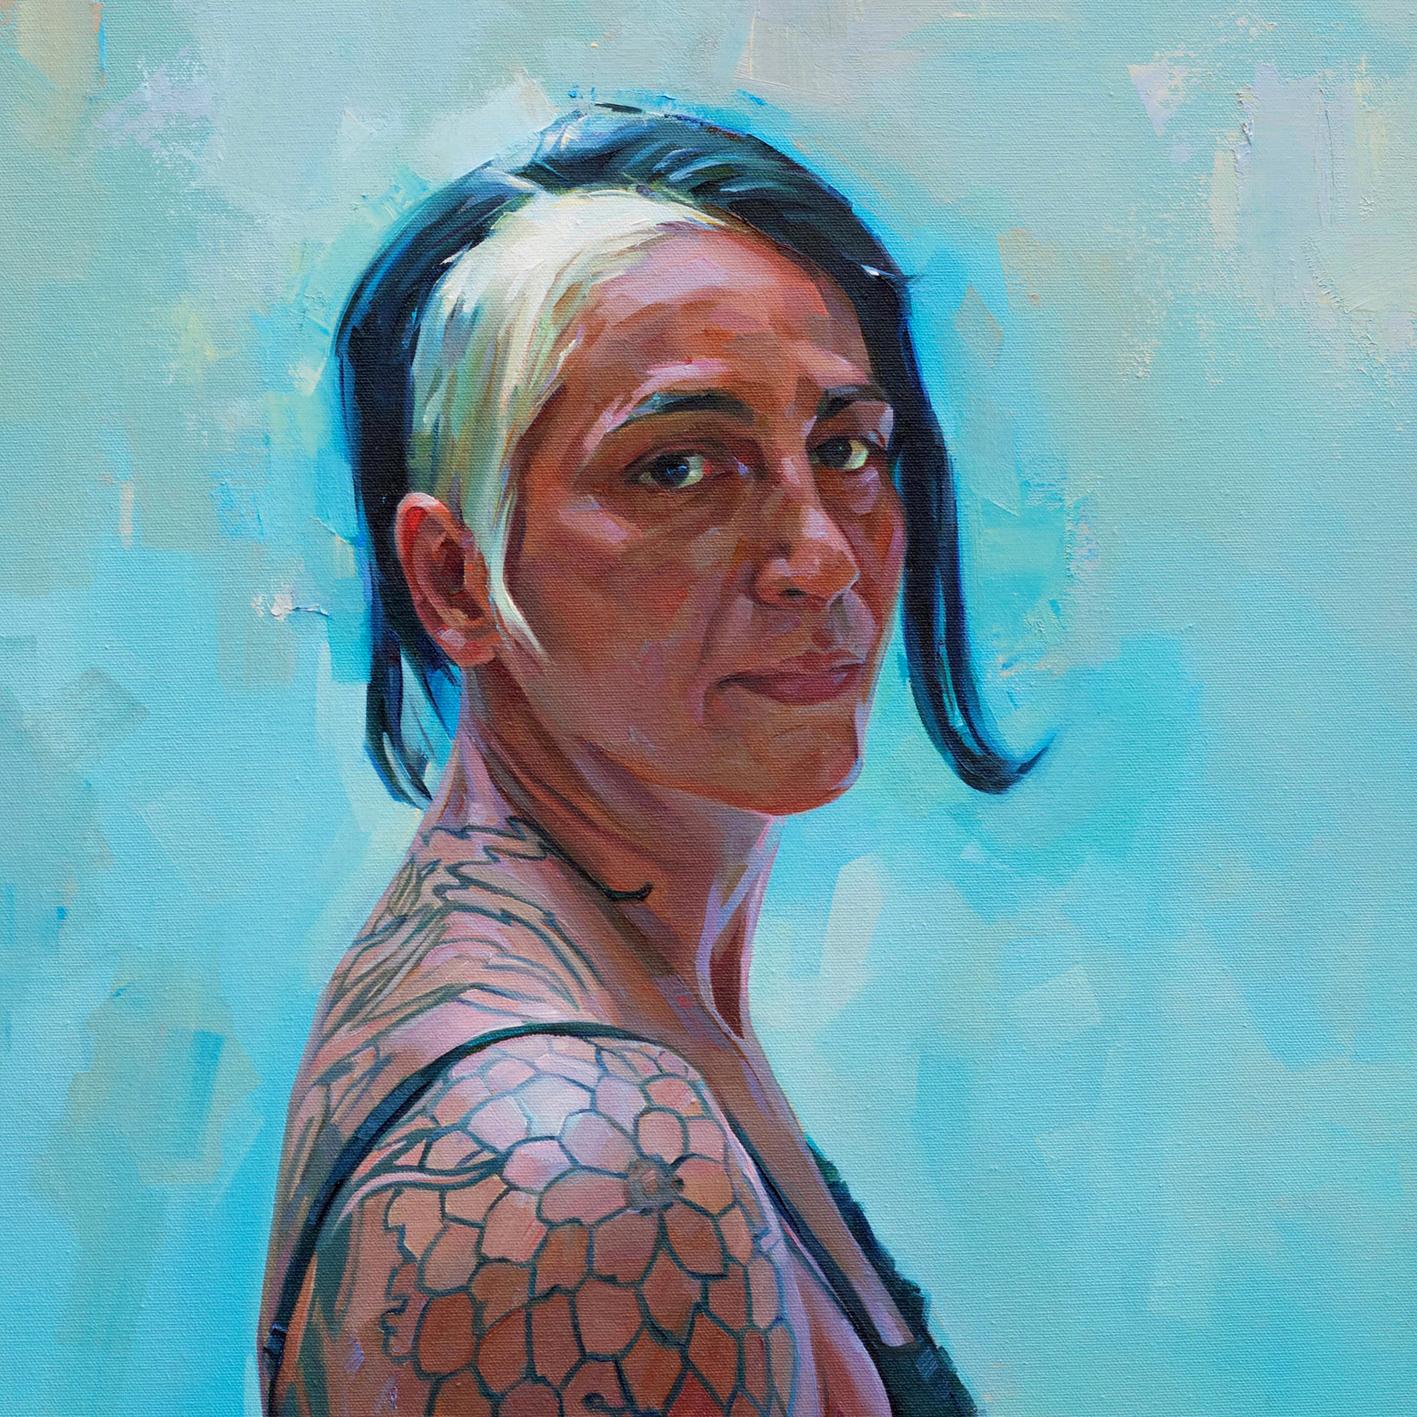 Tia, Tom Croft Oil on canvas, 71.1 x 50.8 cm